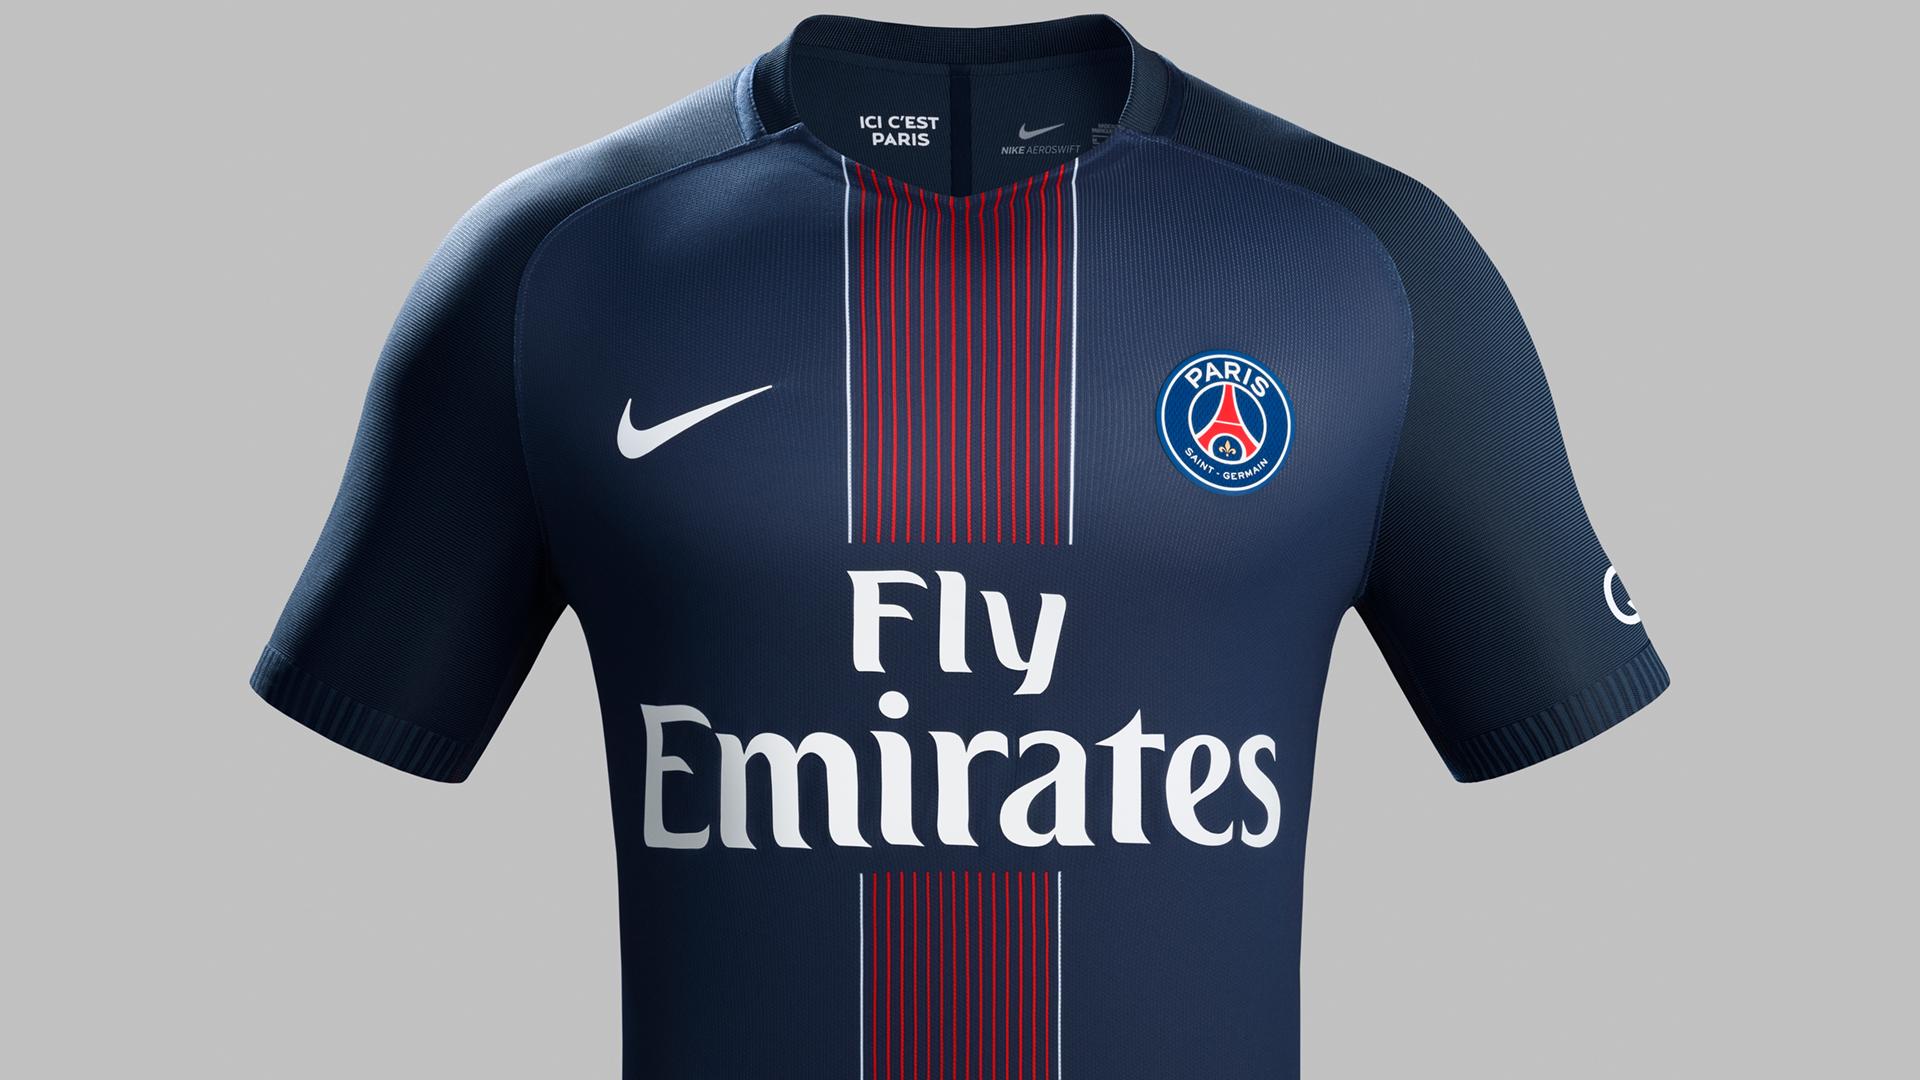 1a67faa05 ... PARIS SAINT-GERMAIN 16 17 HOME KIT - Kicks to the Pitch Yükle  (1920x1080) · Nike Barcelona Suarez  9 Soccer Jersey ...